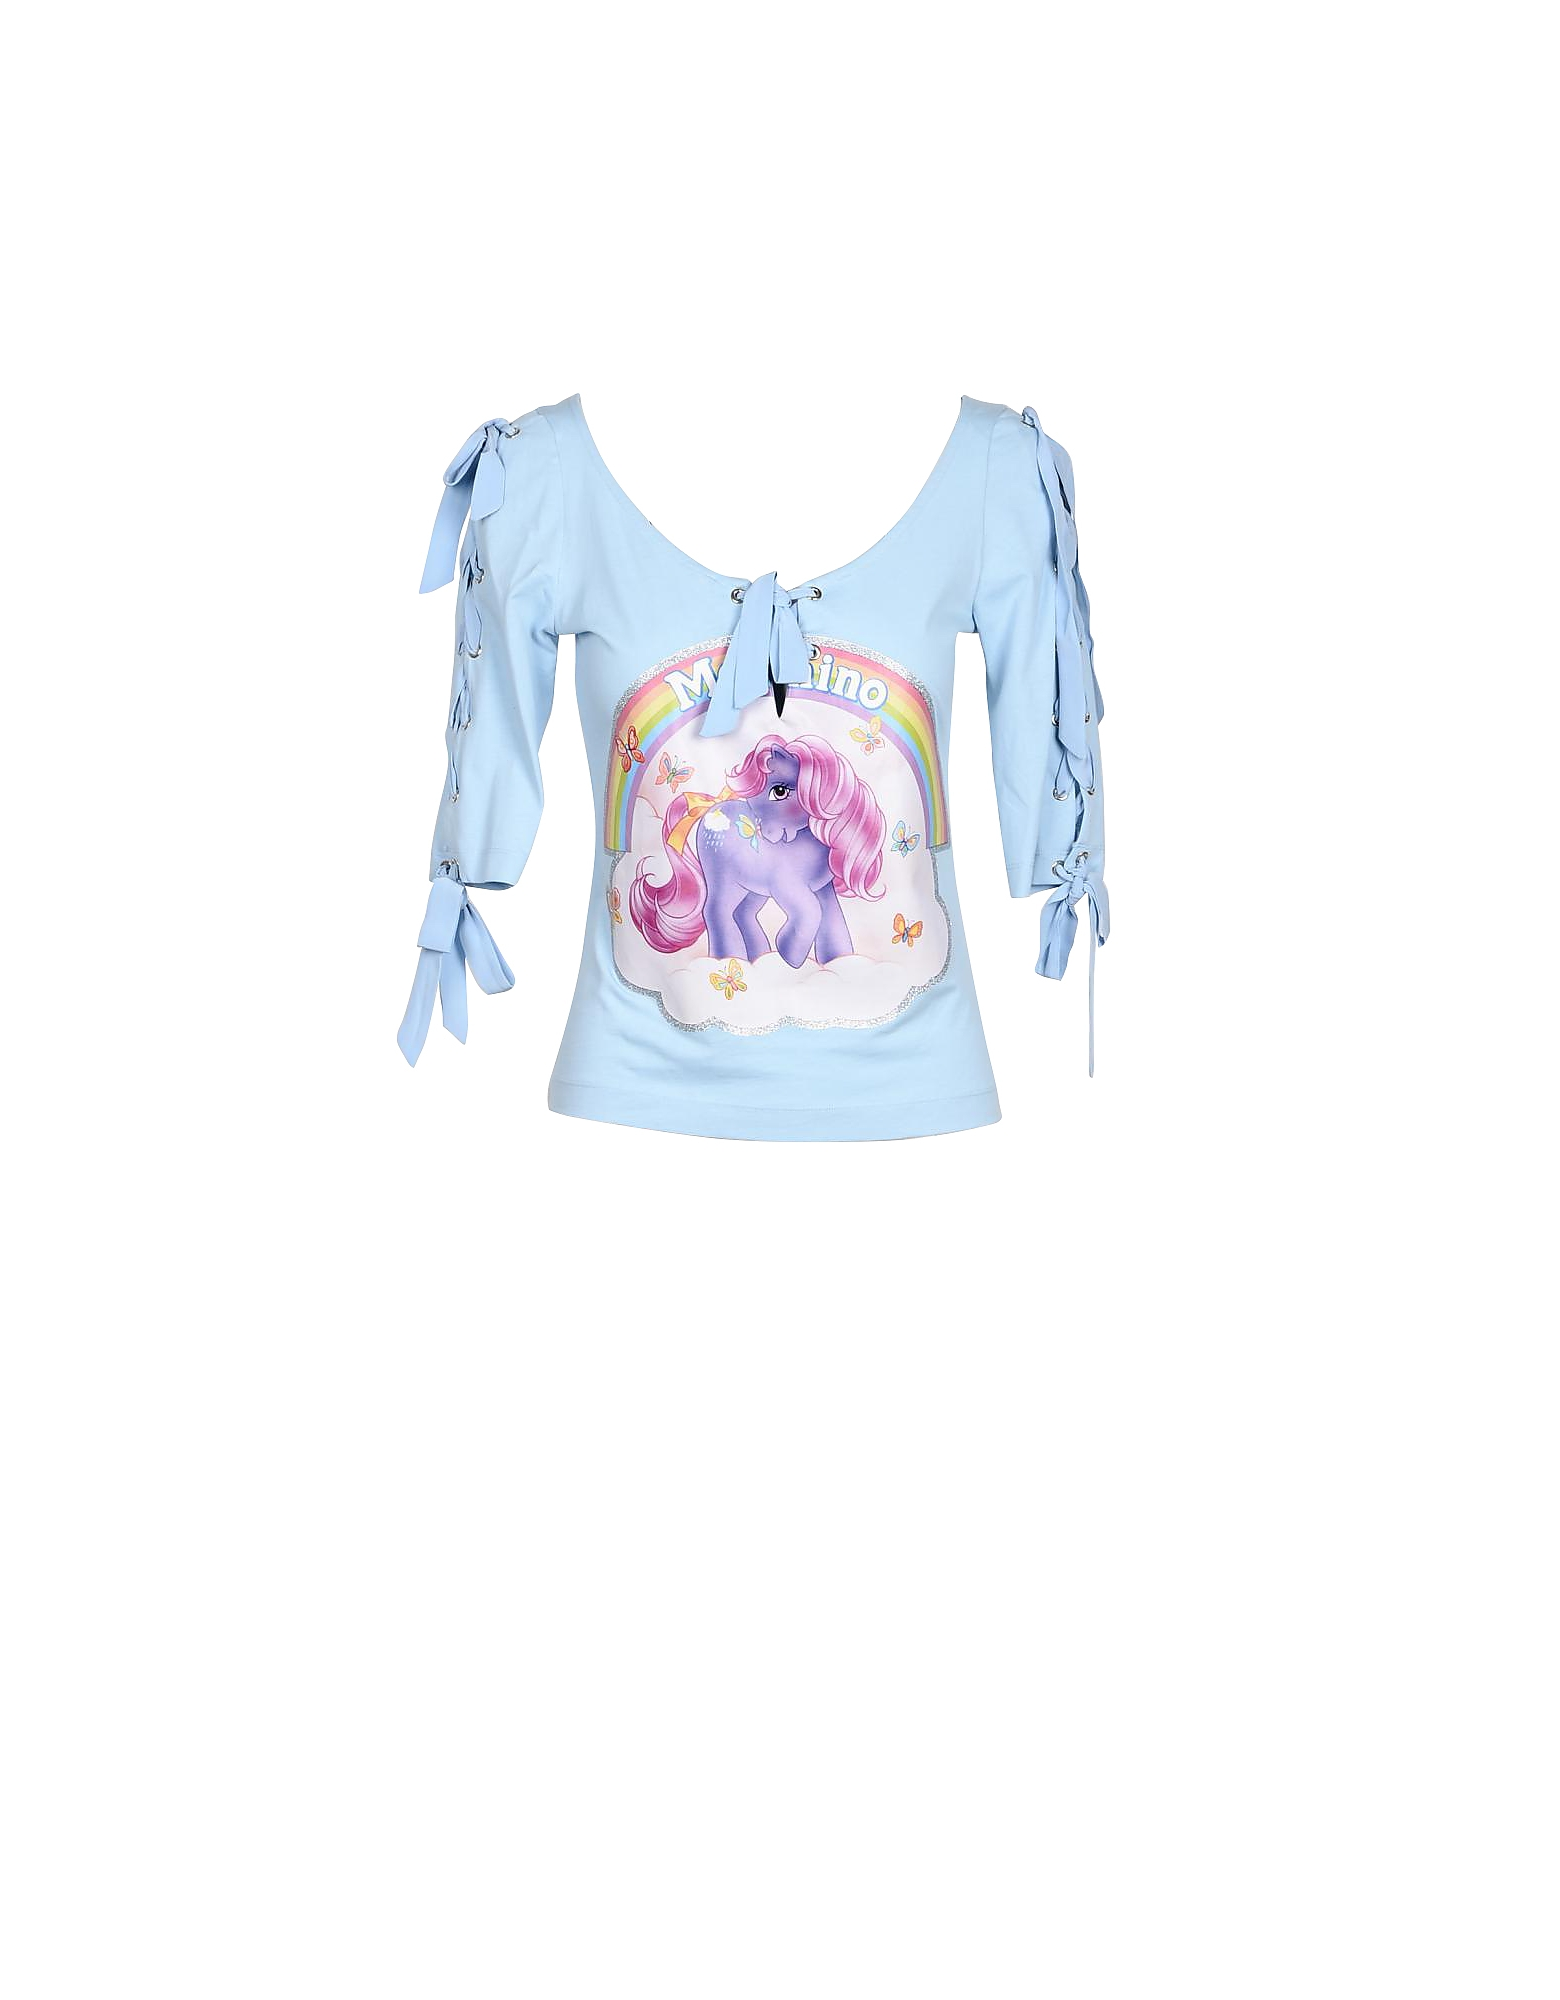 Moschino Designer T-Shirts & Tops, My Little Pony Light Blue Cotton Women's T-Shirt